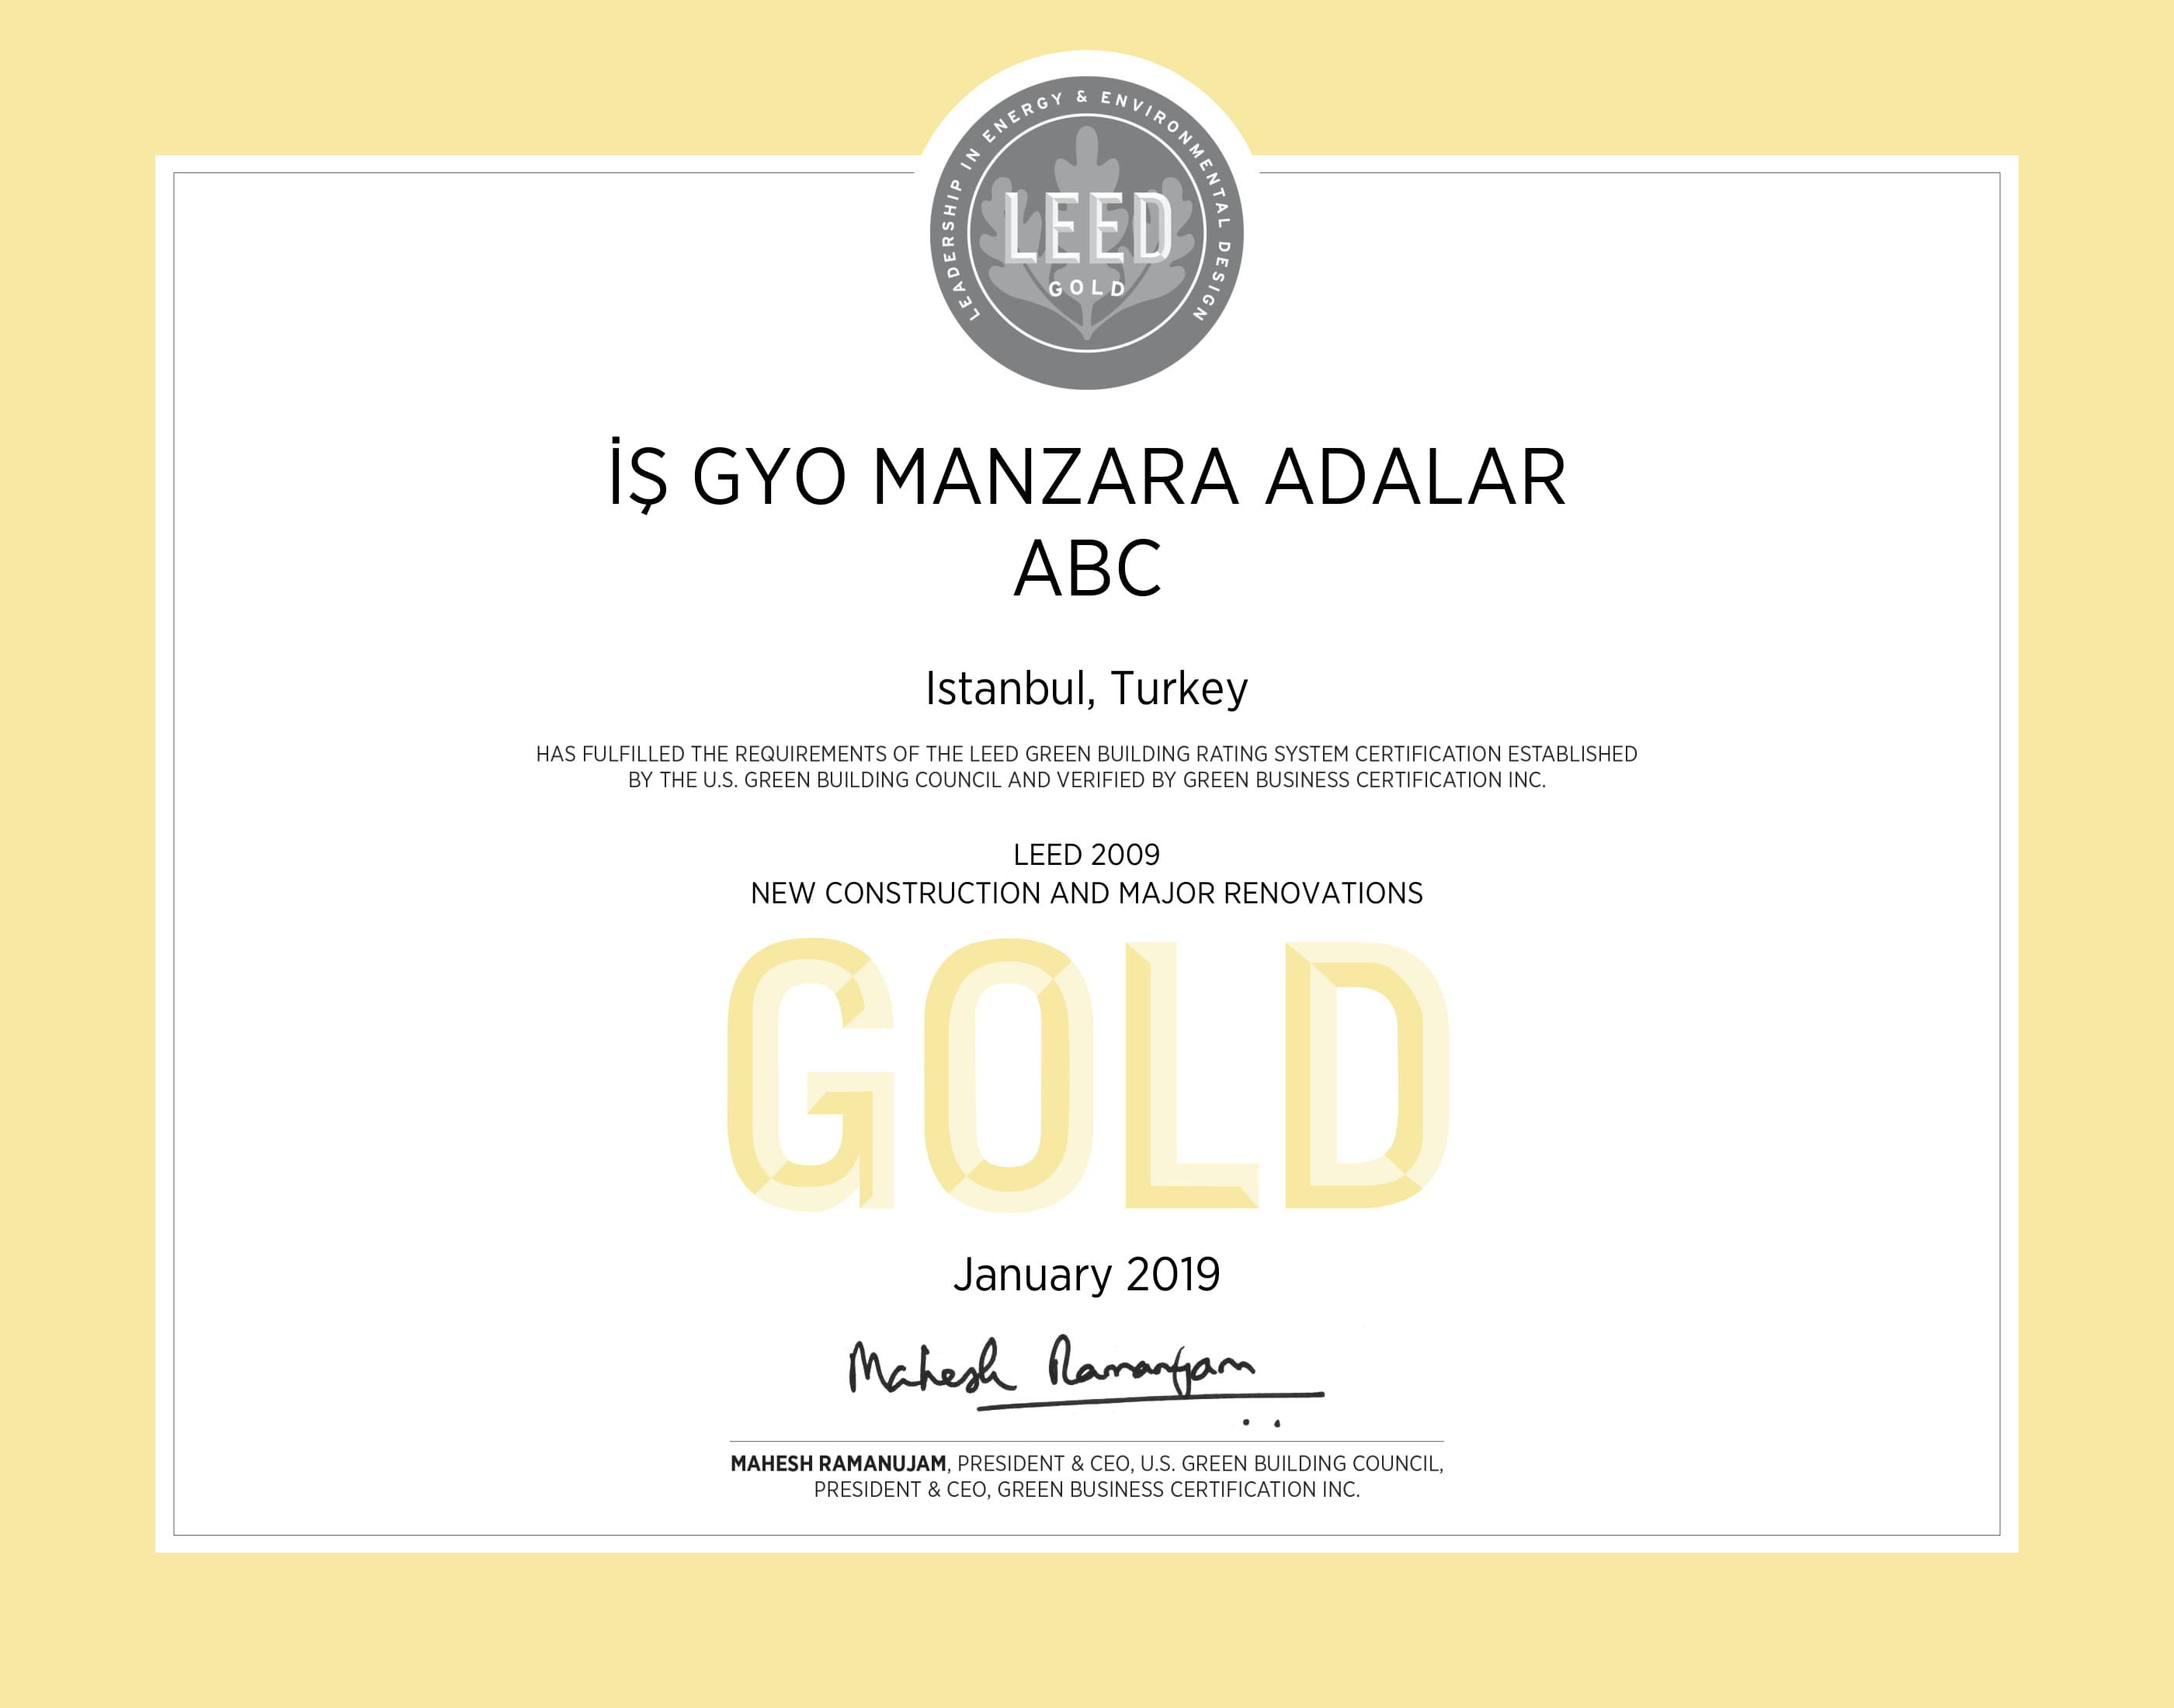 LEED Gold / Manzara Adalar Konut